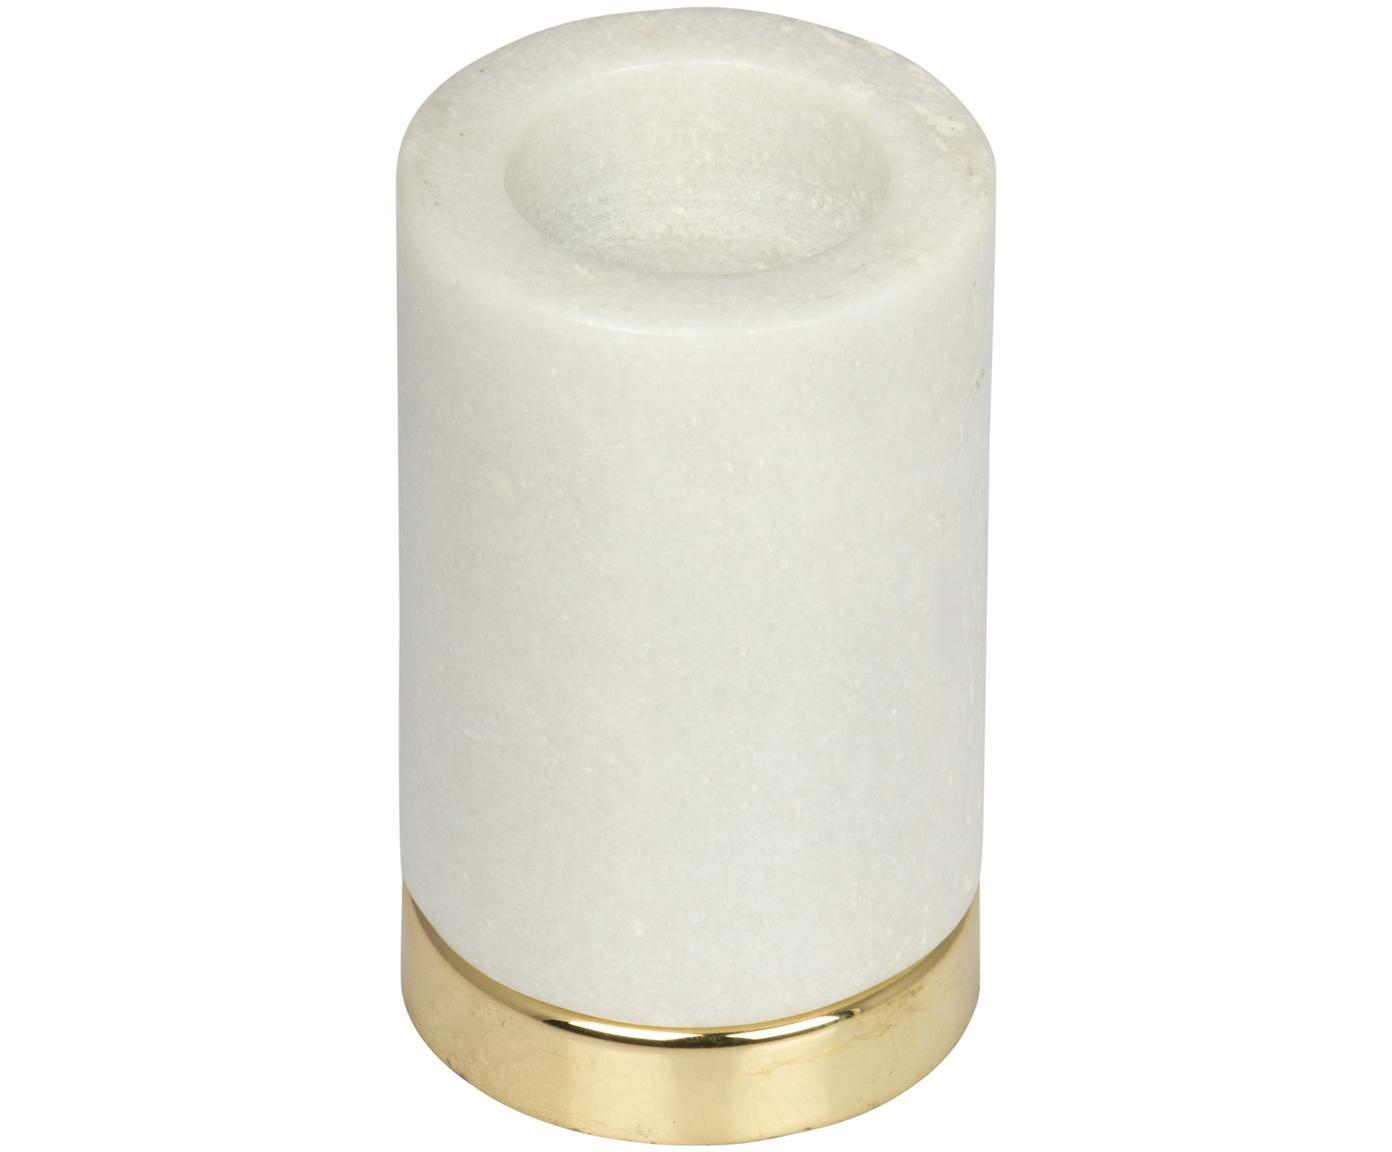 Portalumini Porter, Bianco, ottone, Ø 7 x A 11 cm